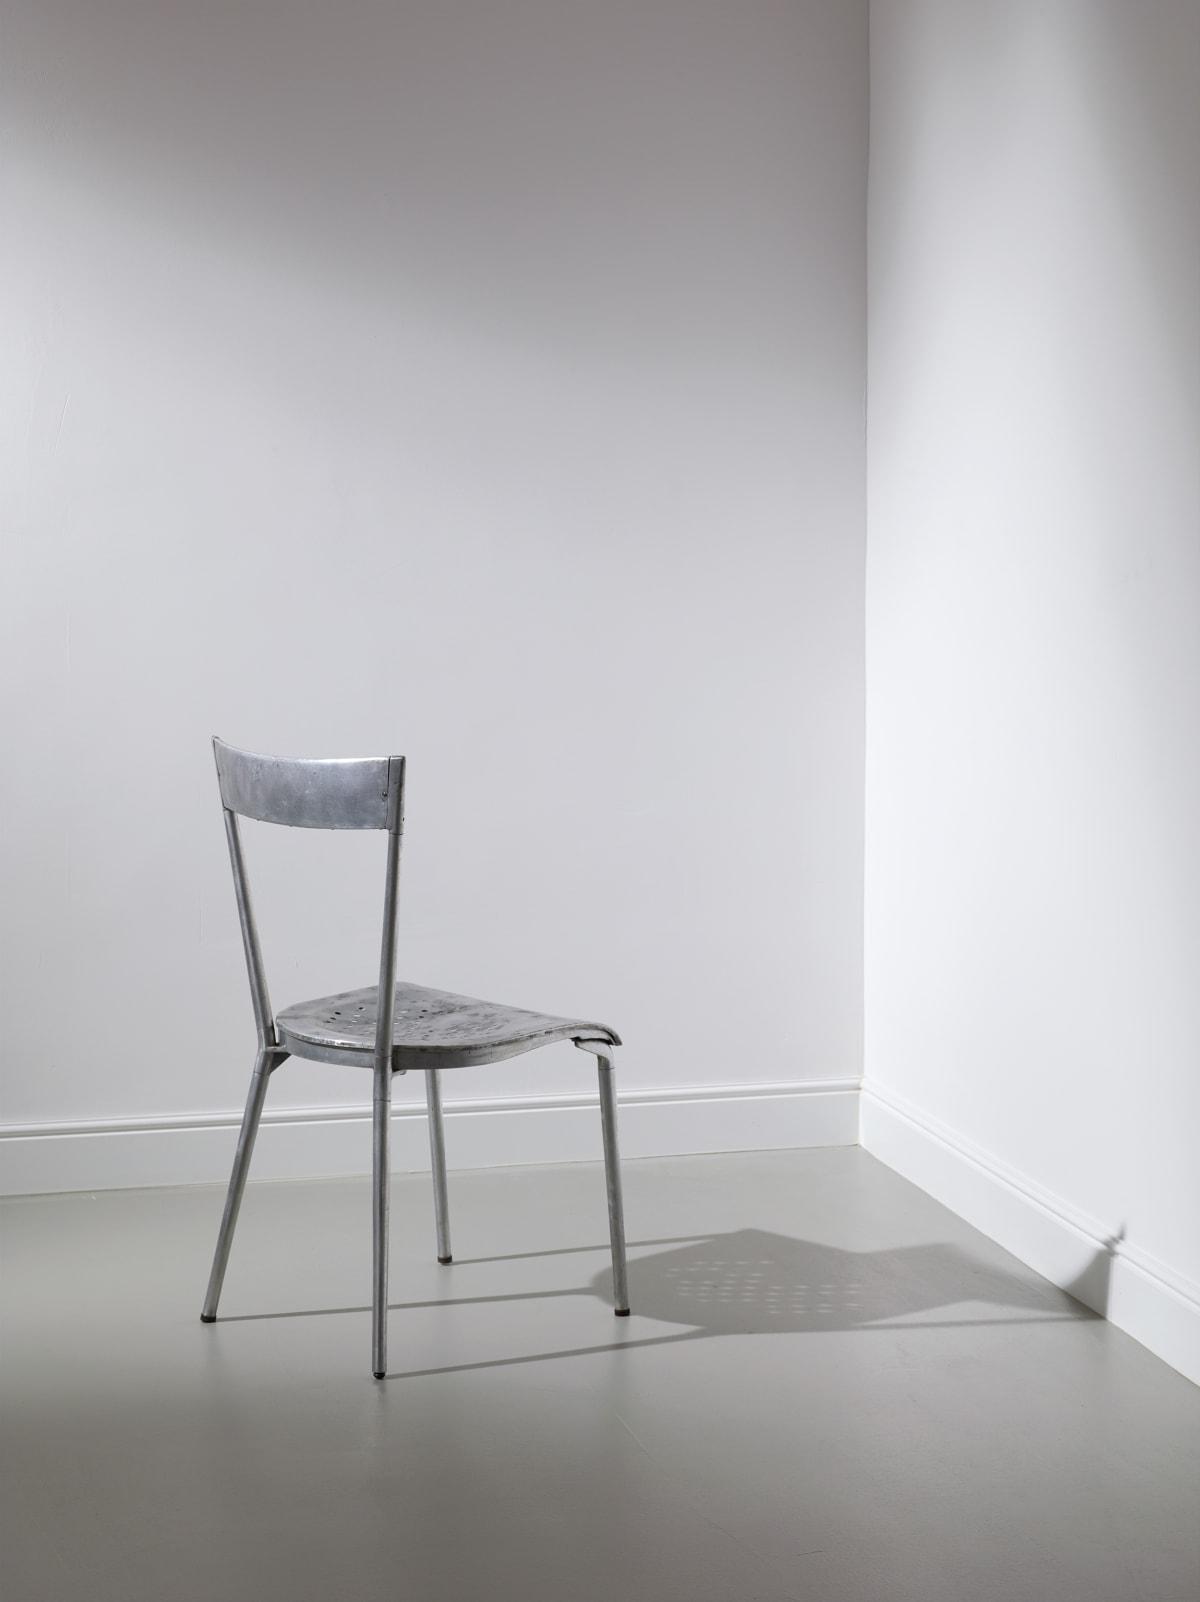 Gio Ponti Chair for the Montecatini office building for Parma Antonio & Figli c.1938 Die-cast aluminium 86 x 43 x 40 cm